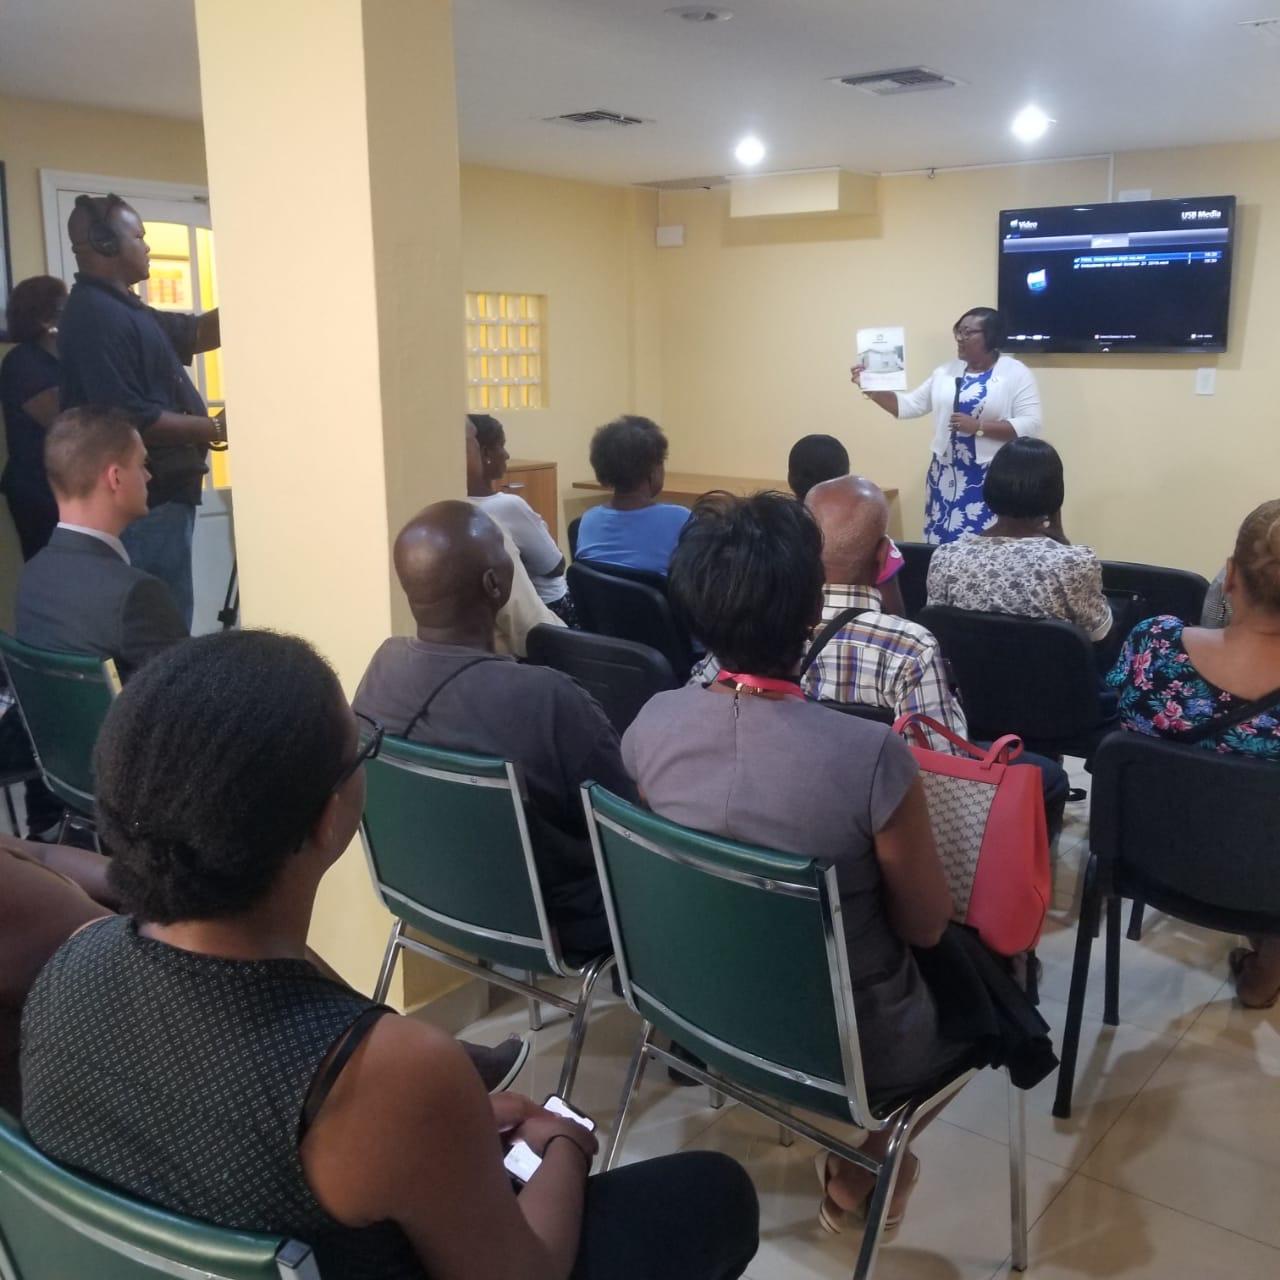 Ombudsman short film launch - 25 Oct 2019